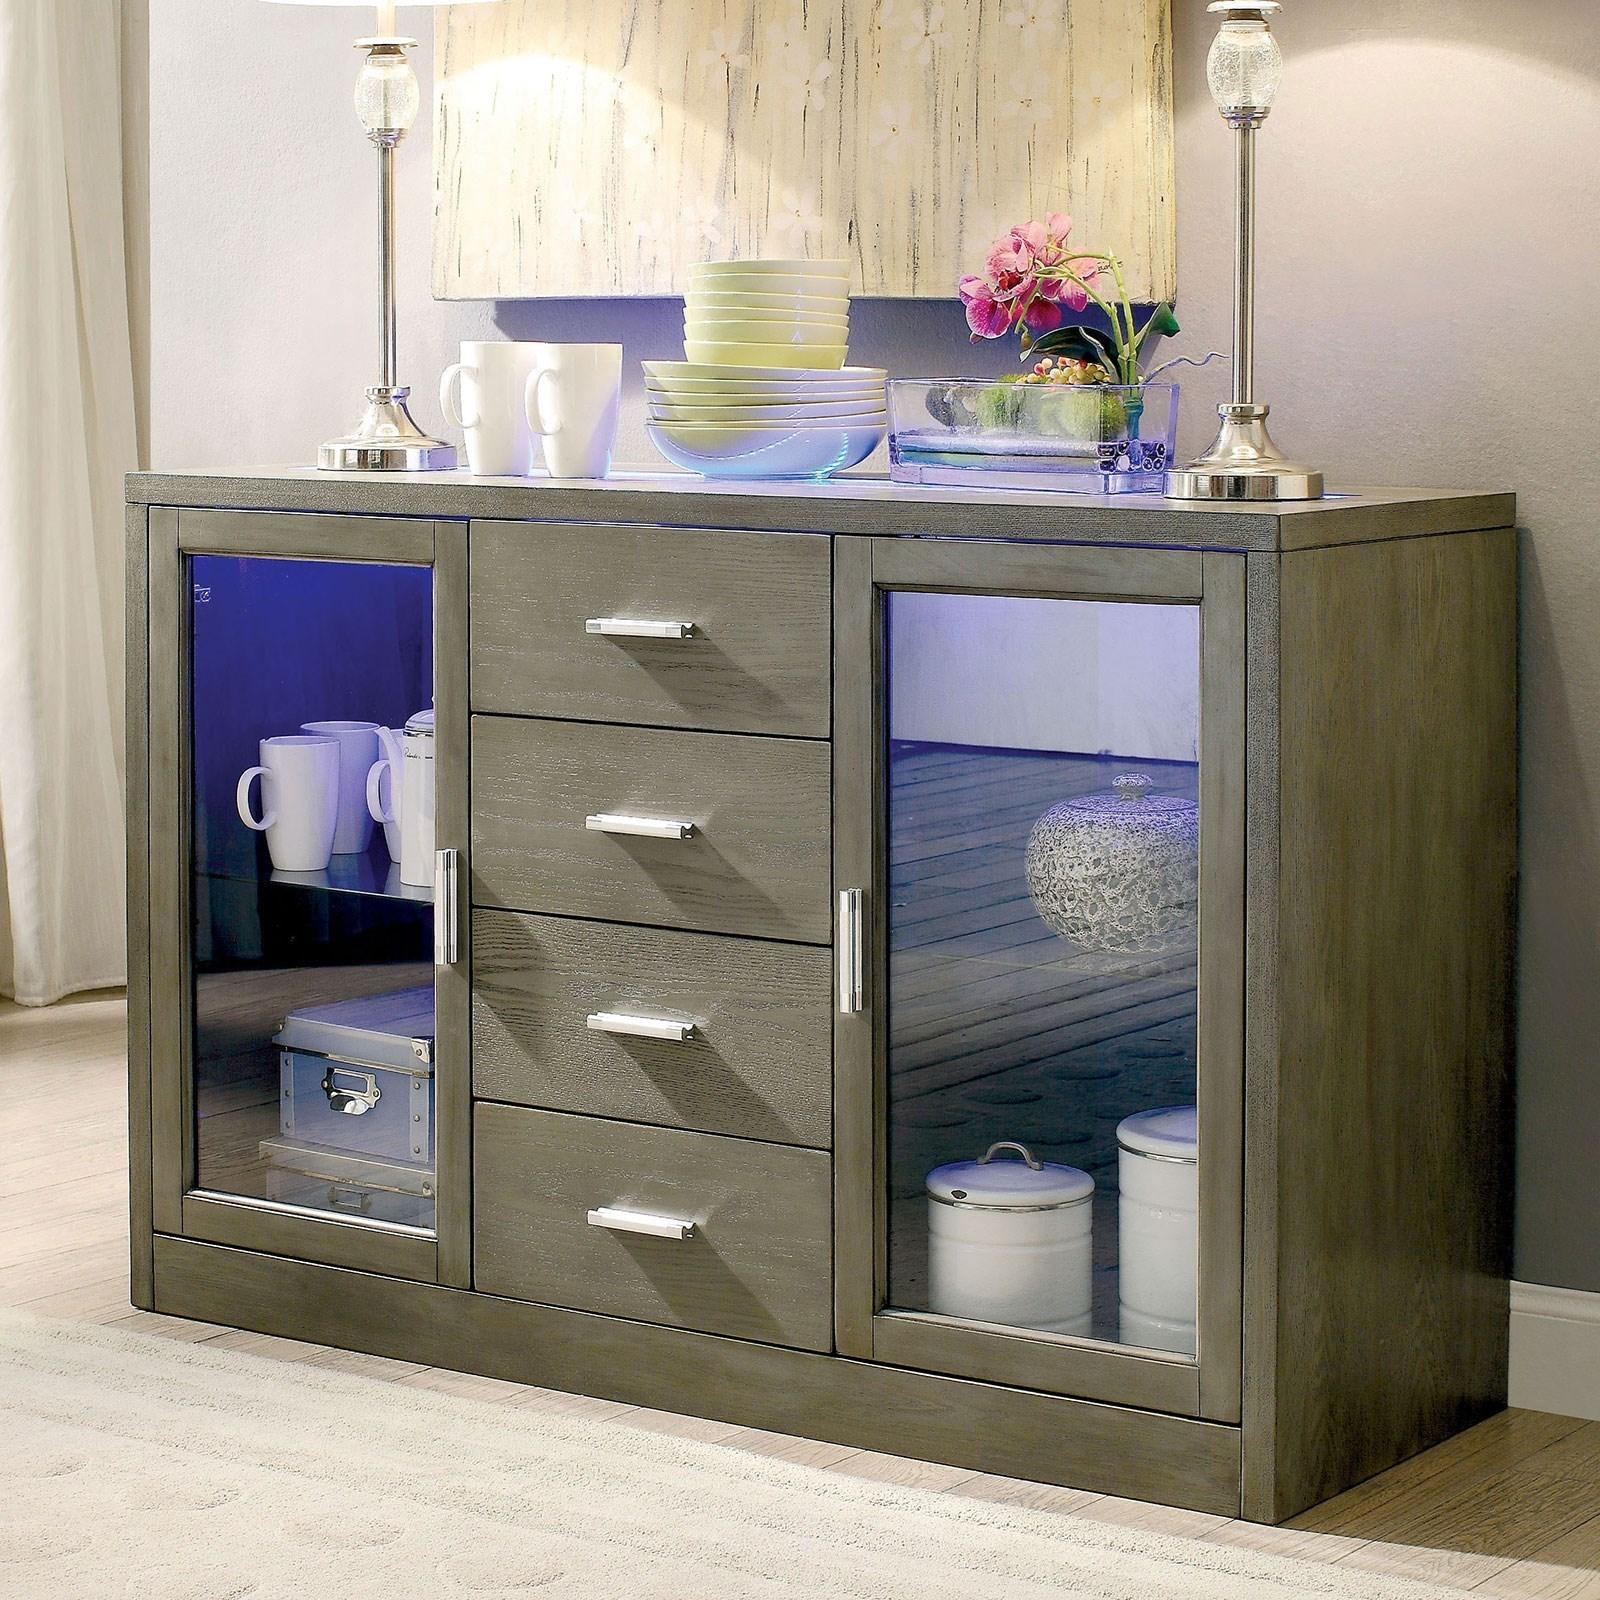 Luminar Server by Furniture of America at Nassau Furniture and Mattress